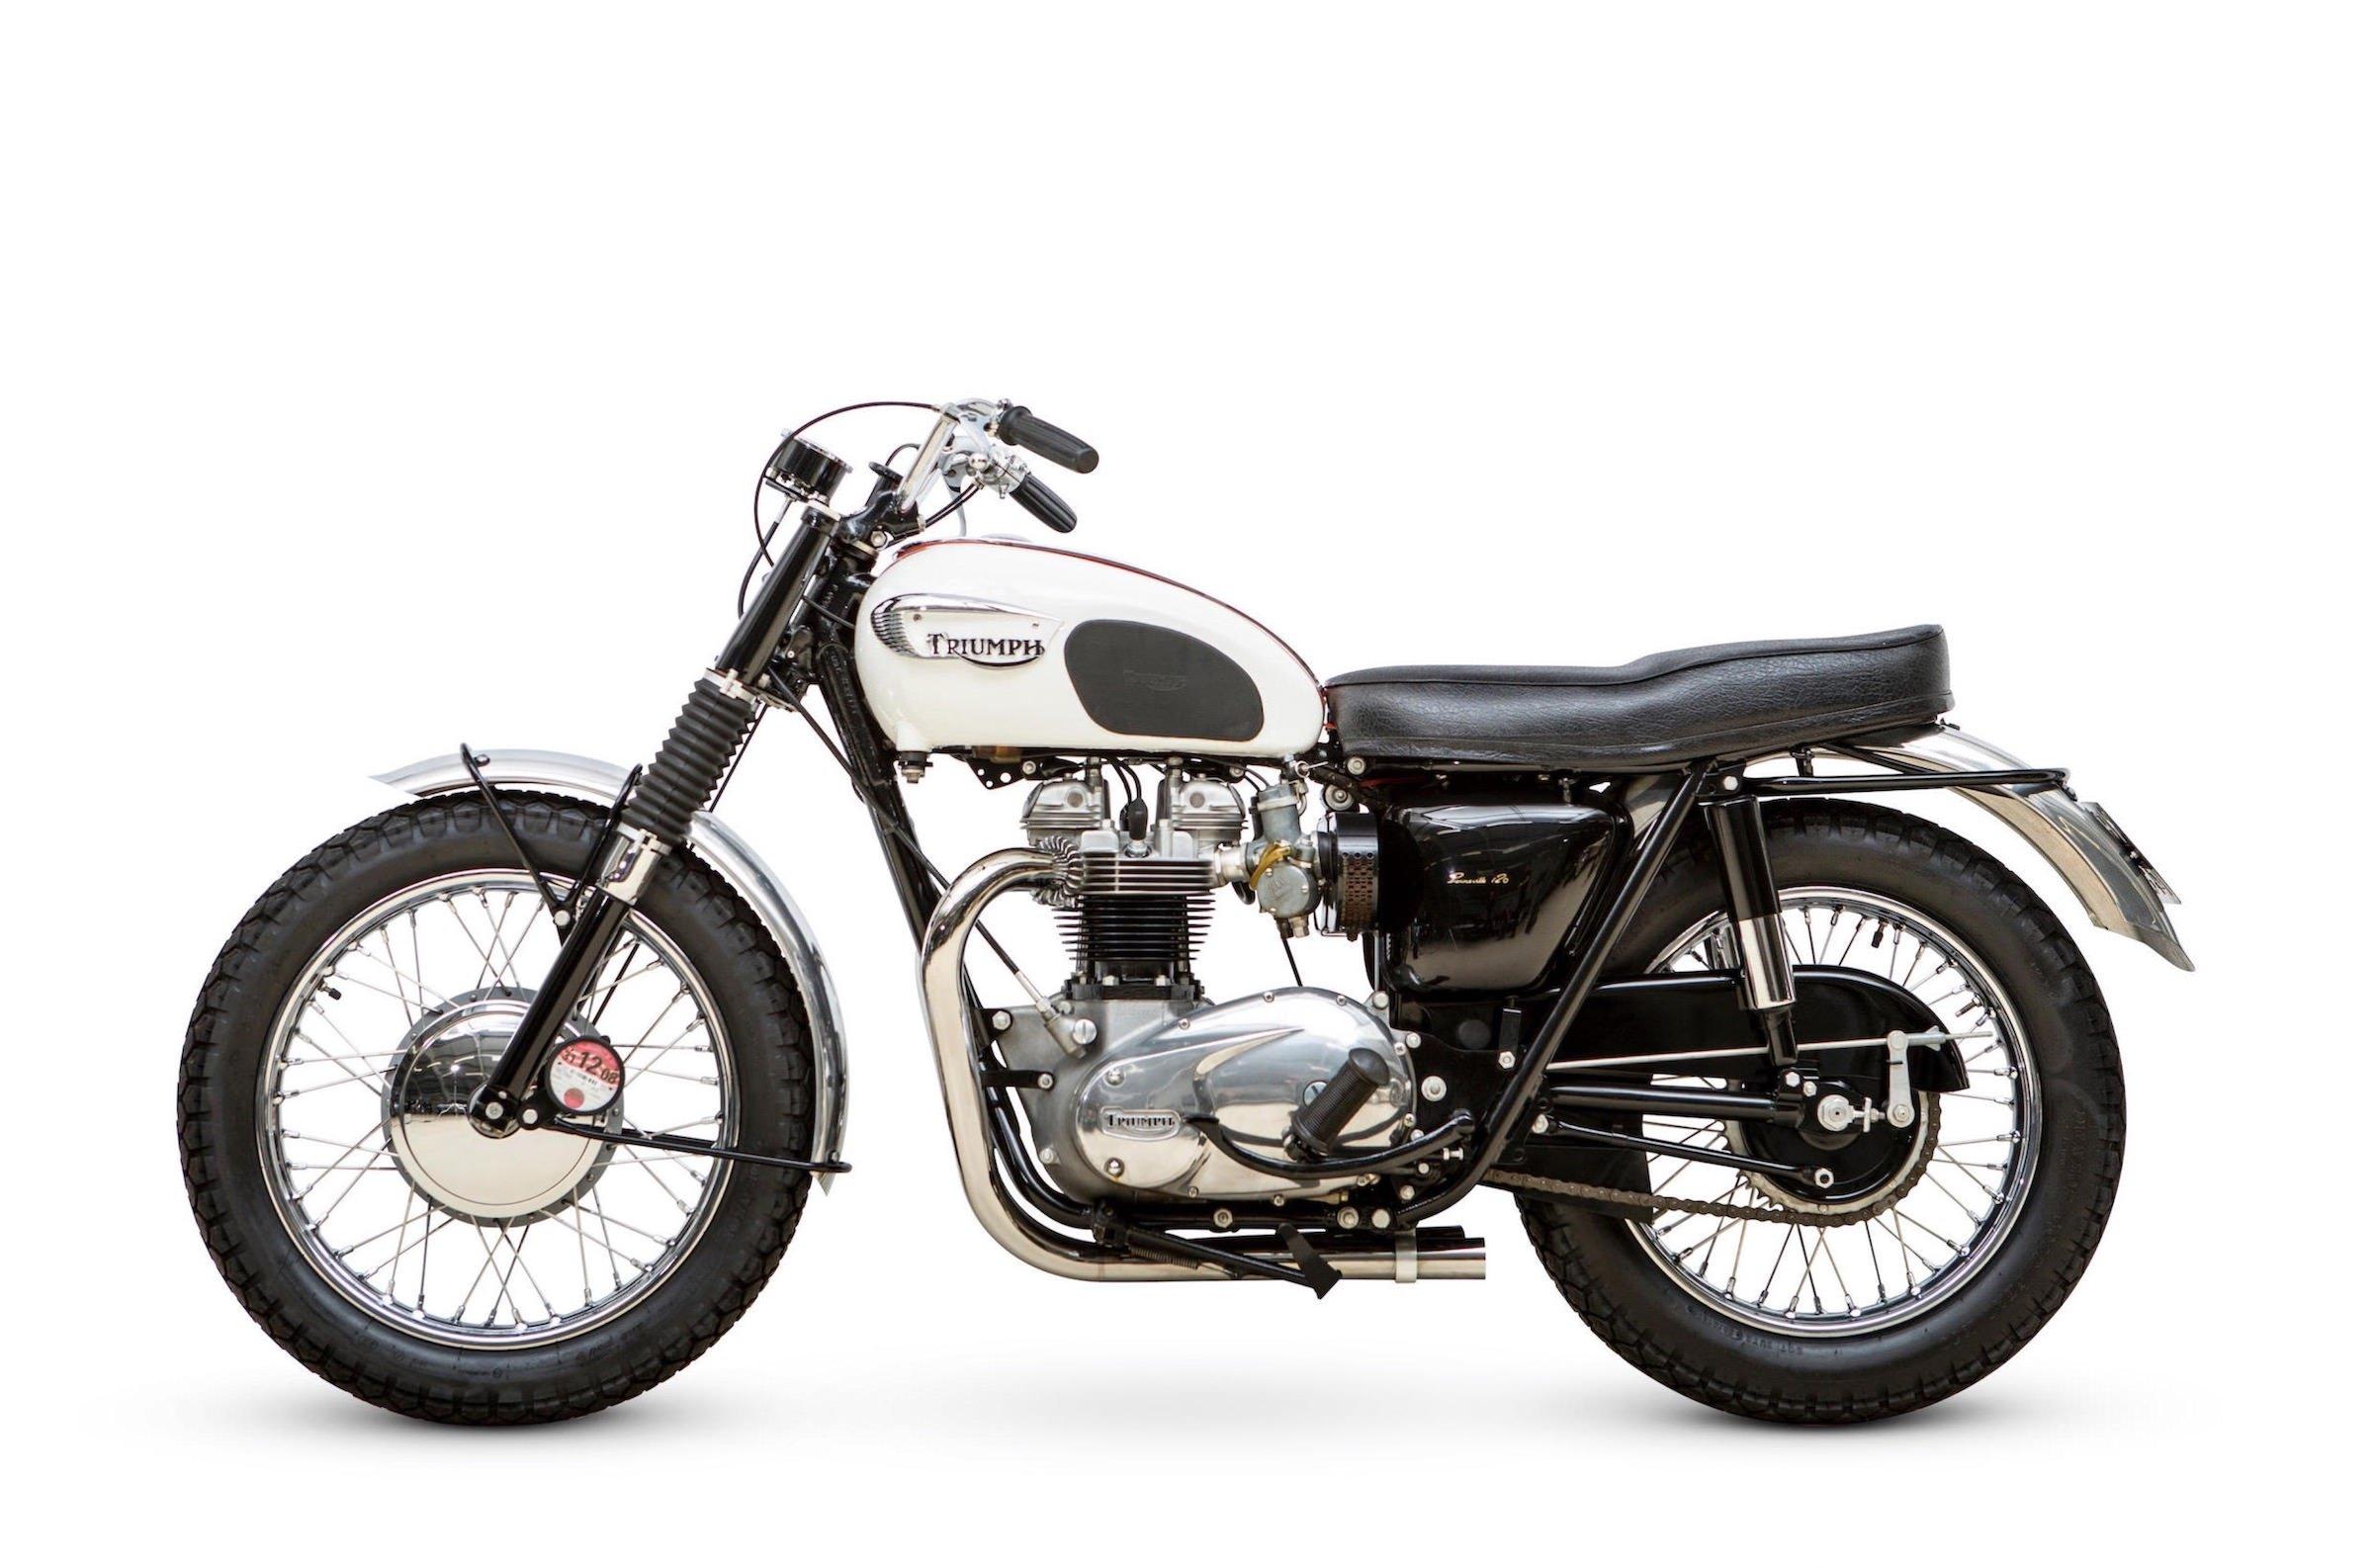 The Triumph Bonneville TT Special - The Rare Factory TT